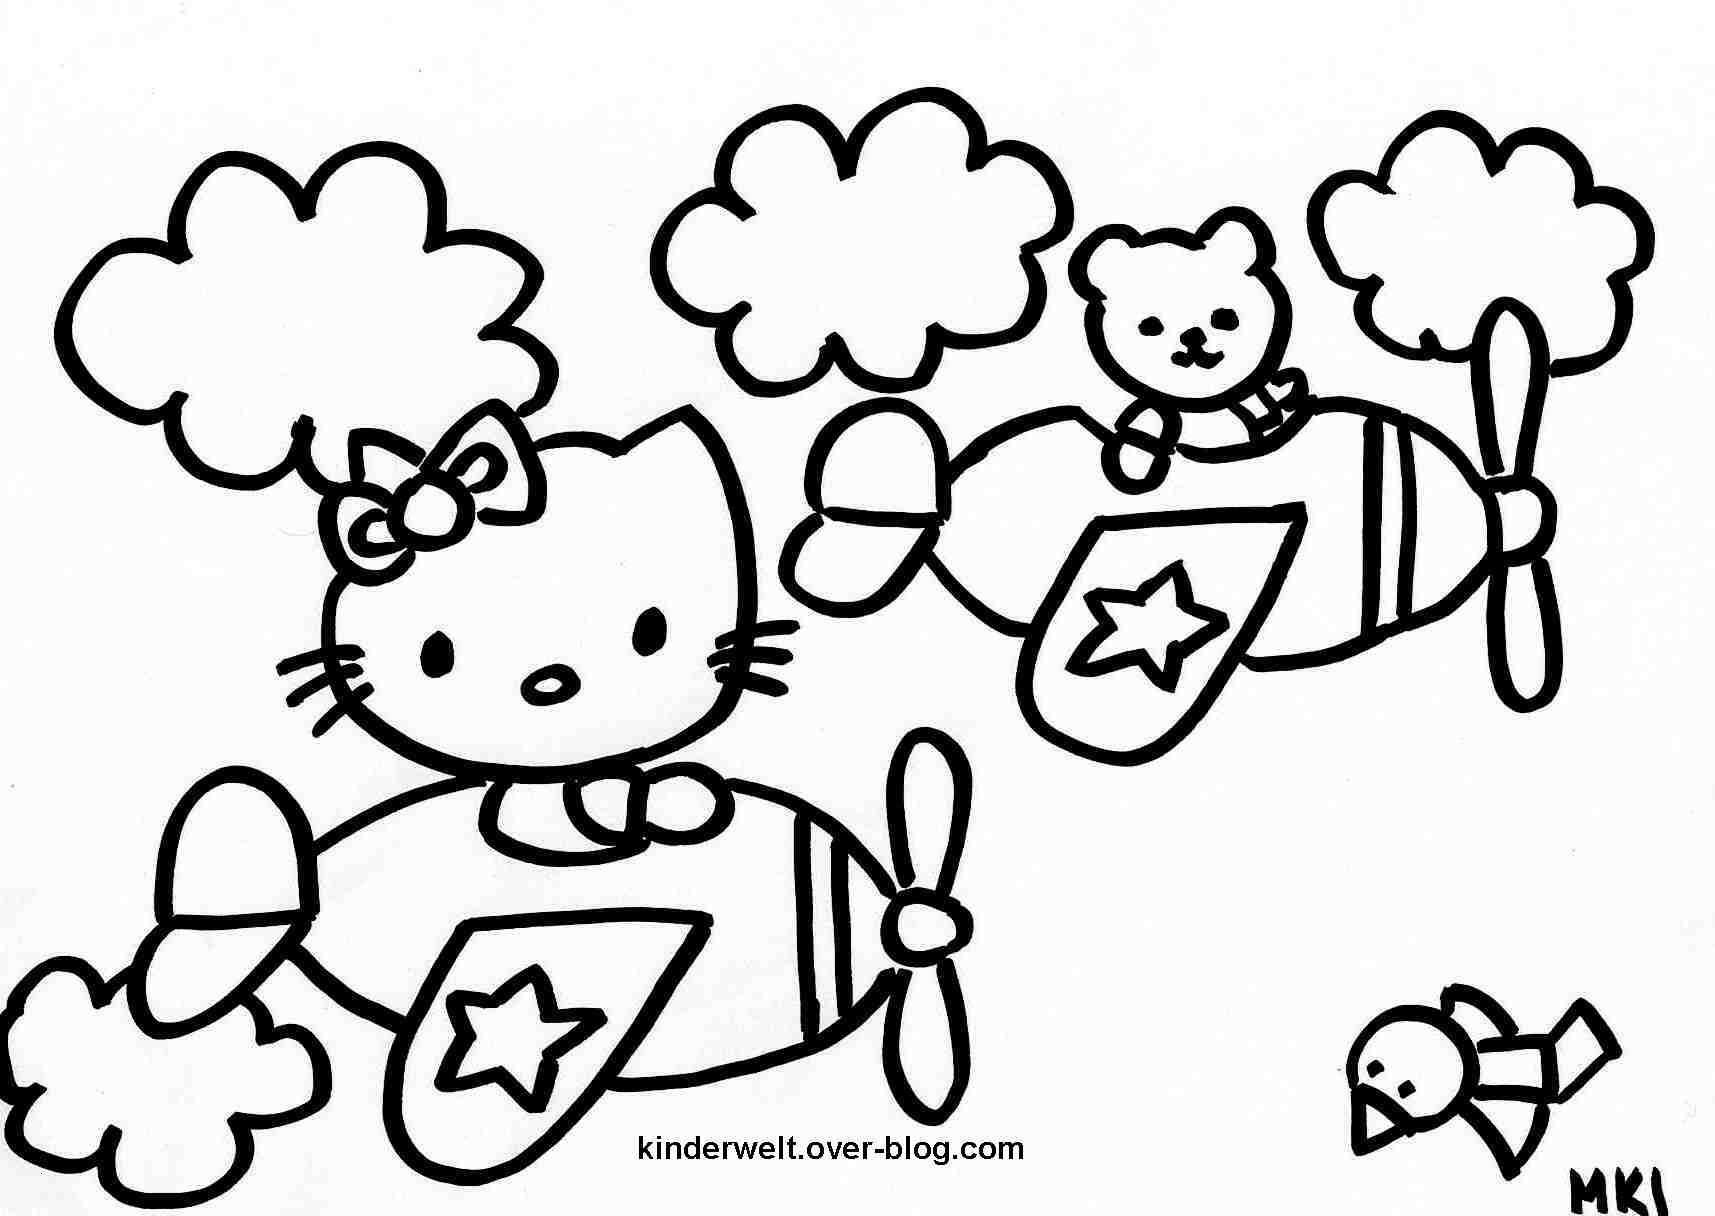 My Little Pony Ausmalbild Neu Ausmalbilder Hallo Kitty Kostenlos Malvorlagen Zum Ausdrucken Bild